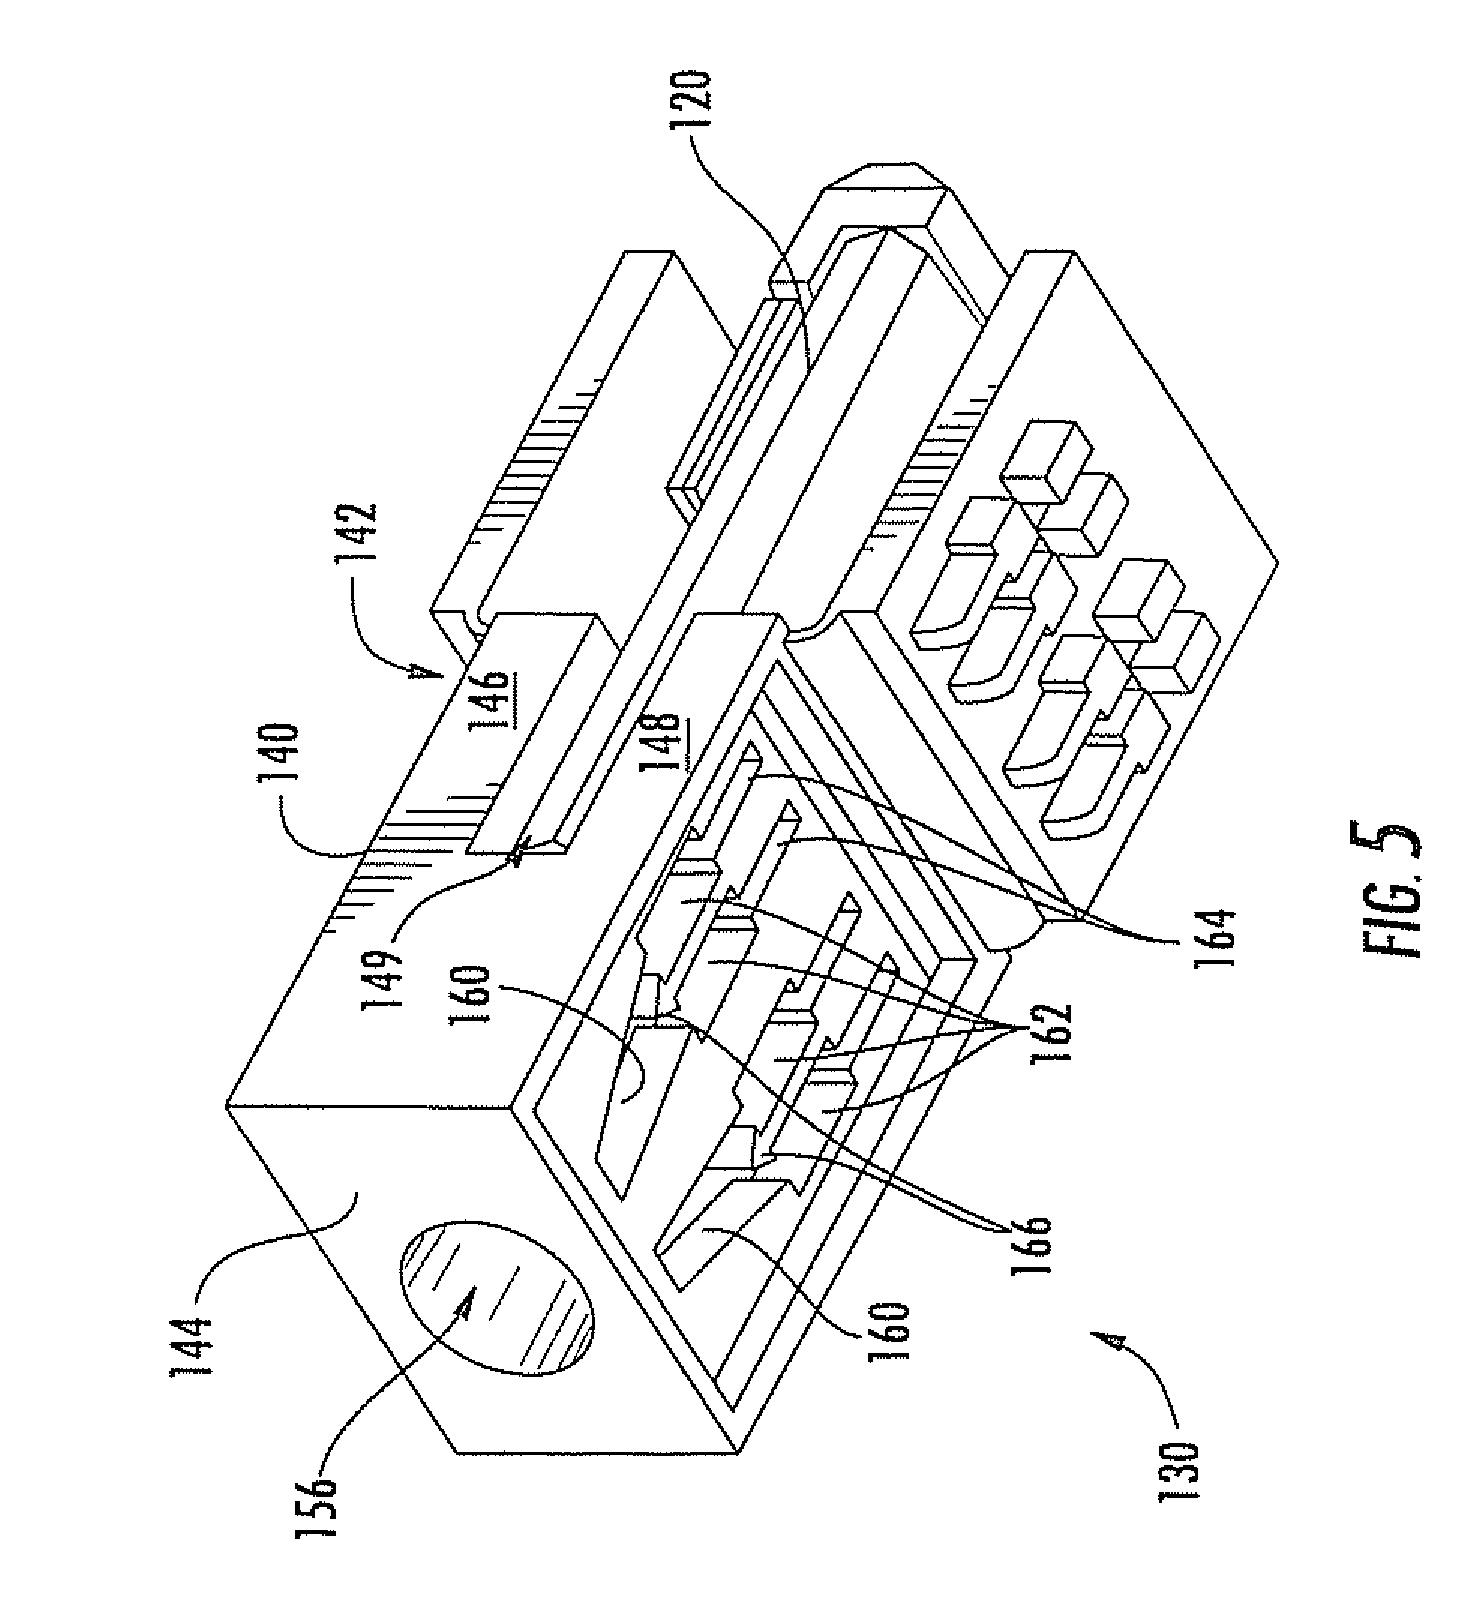 Rj45 Wiring Diagram Printable Rj45 Free Engine Image For